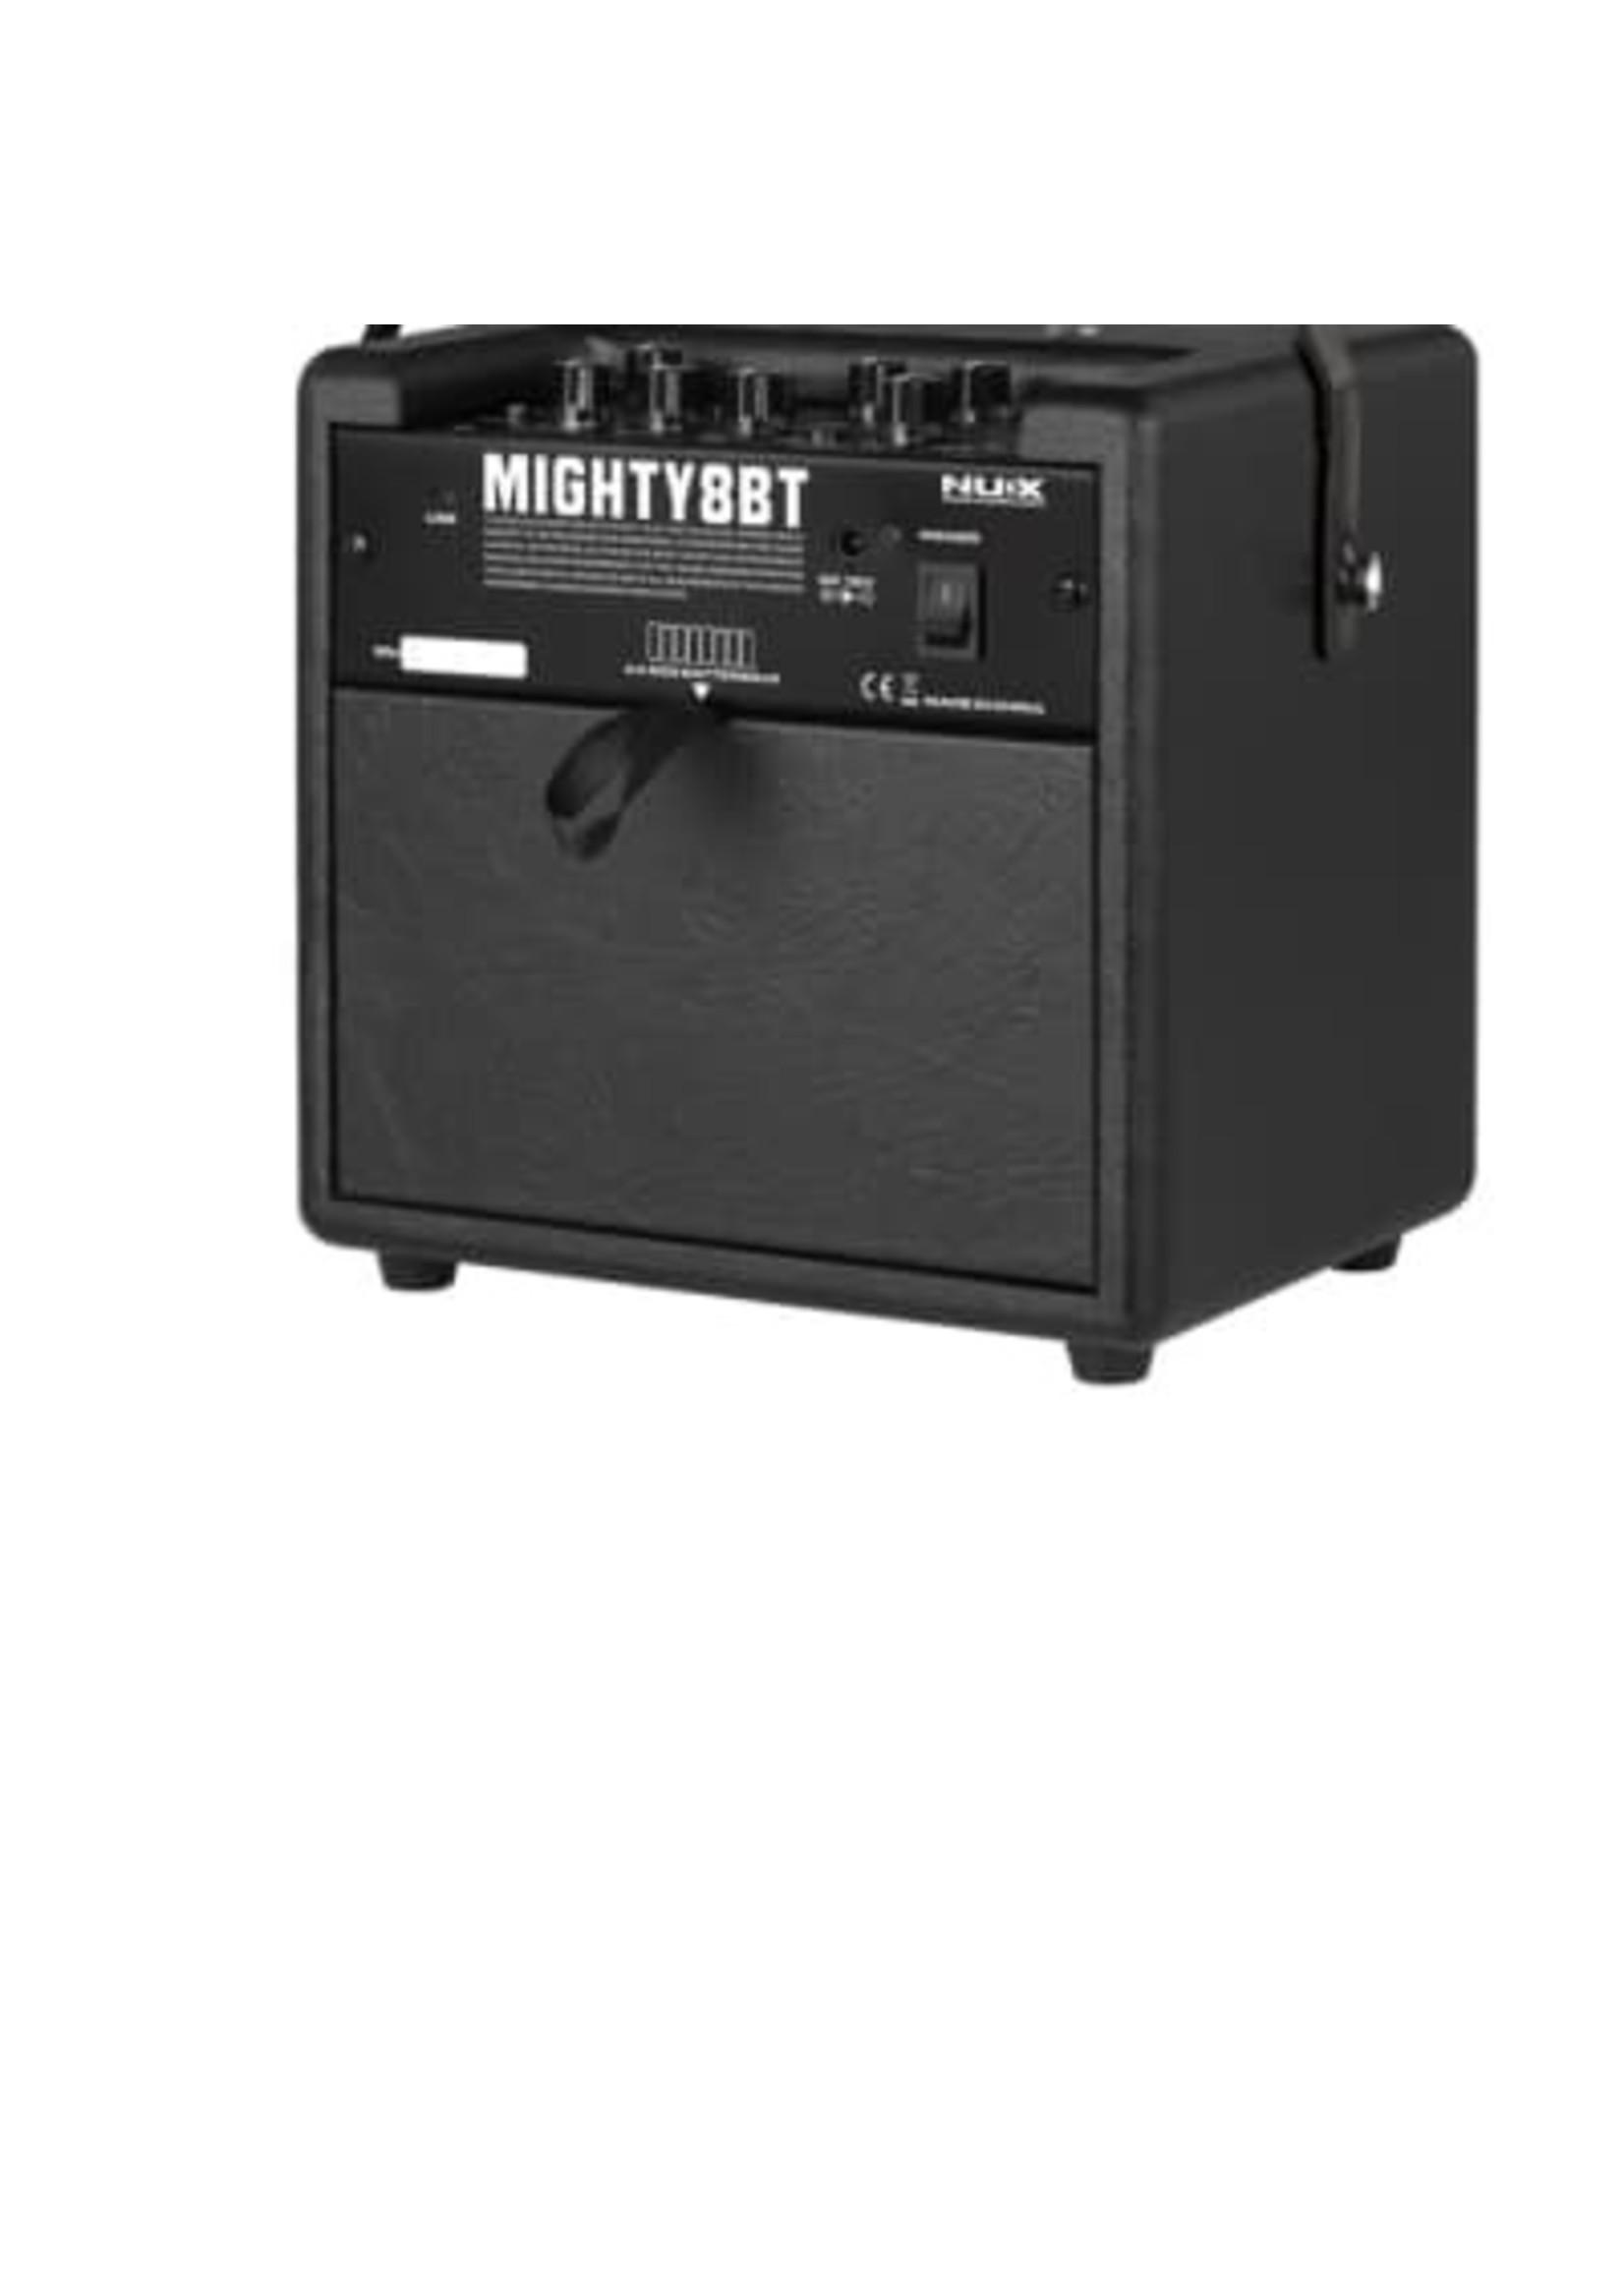 NuX NuX Mighty 8BT Guitar Amplifier